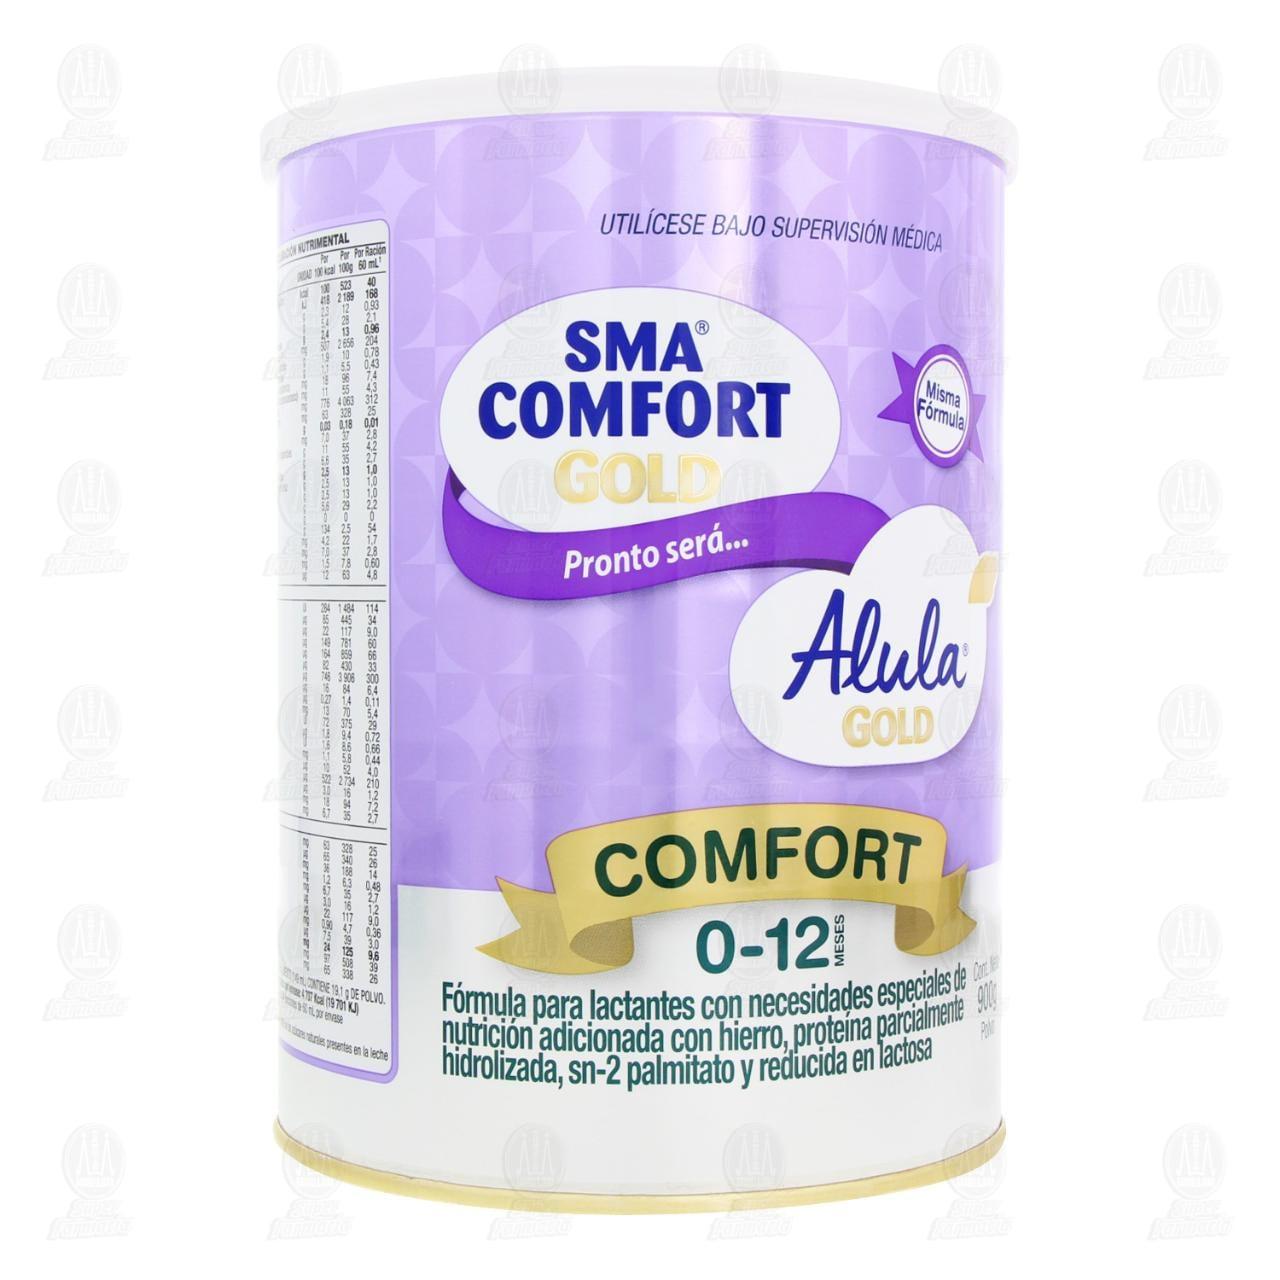 Comprar Fórmula Infantil SMA Comfort Gold en Polvo (Edad 0-12 Meses), 900 gr. en Farmacias Guadalajara